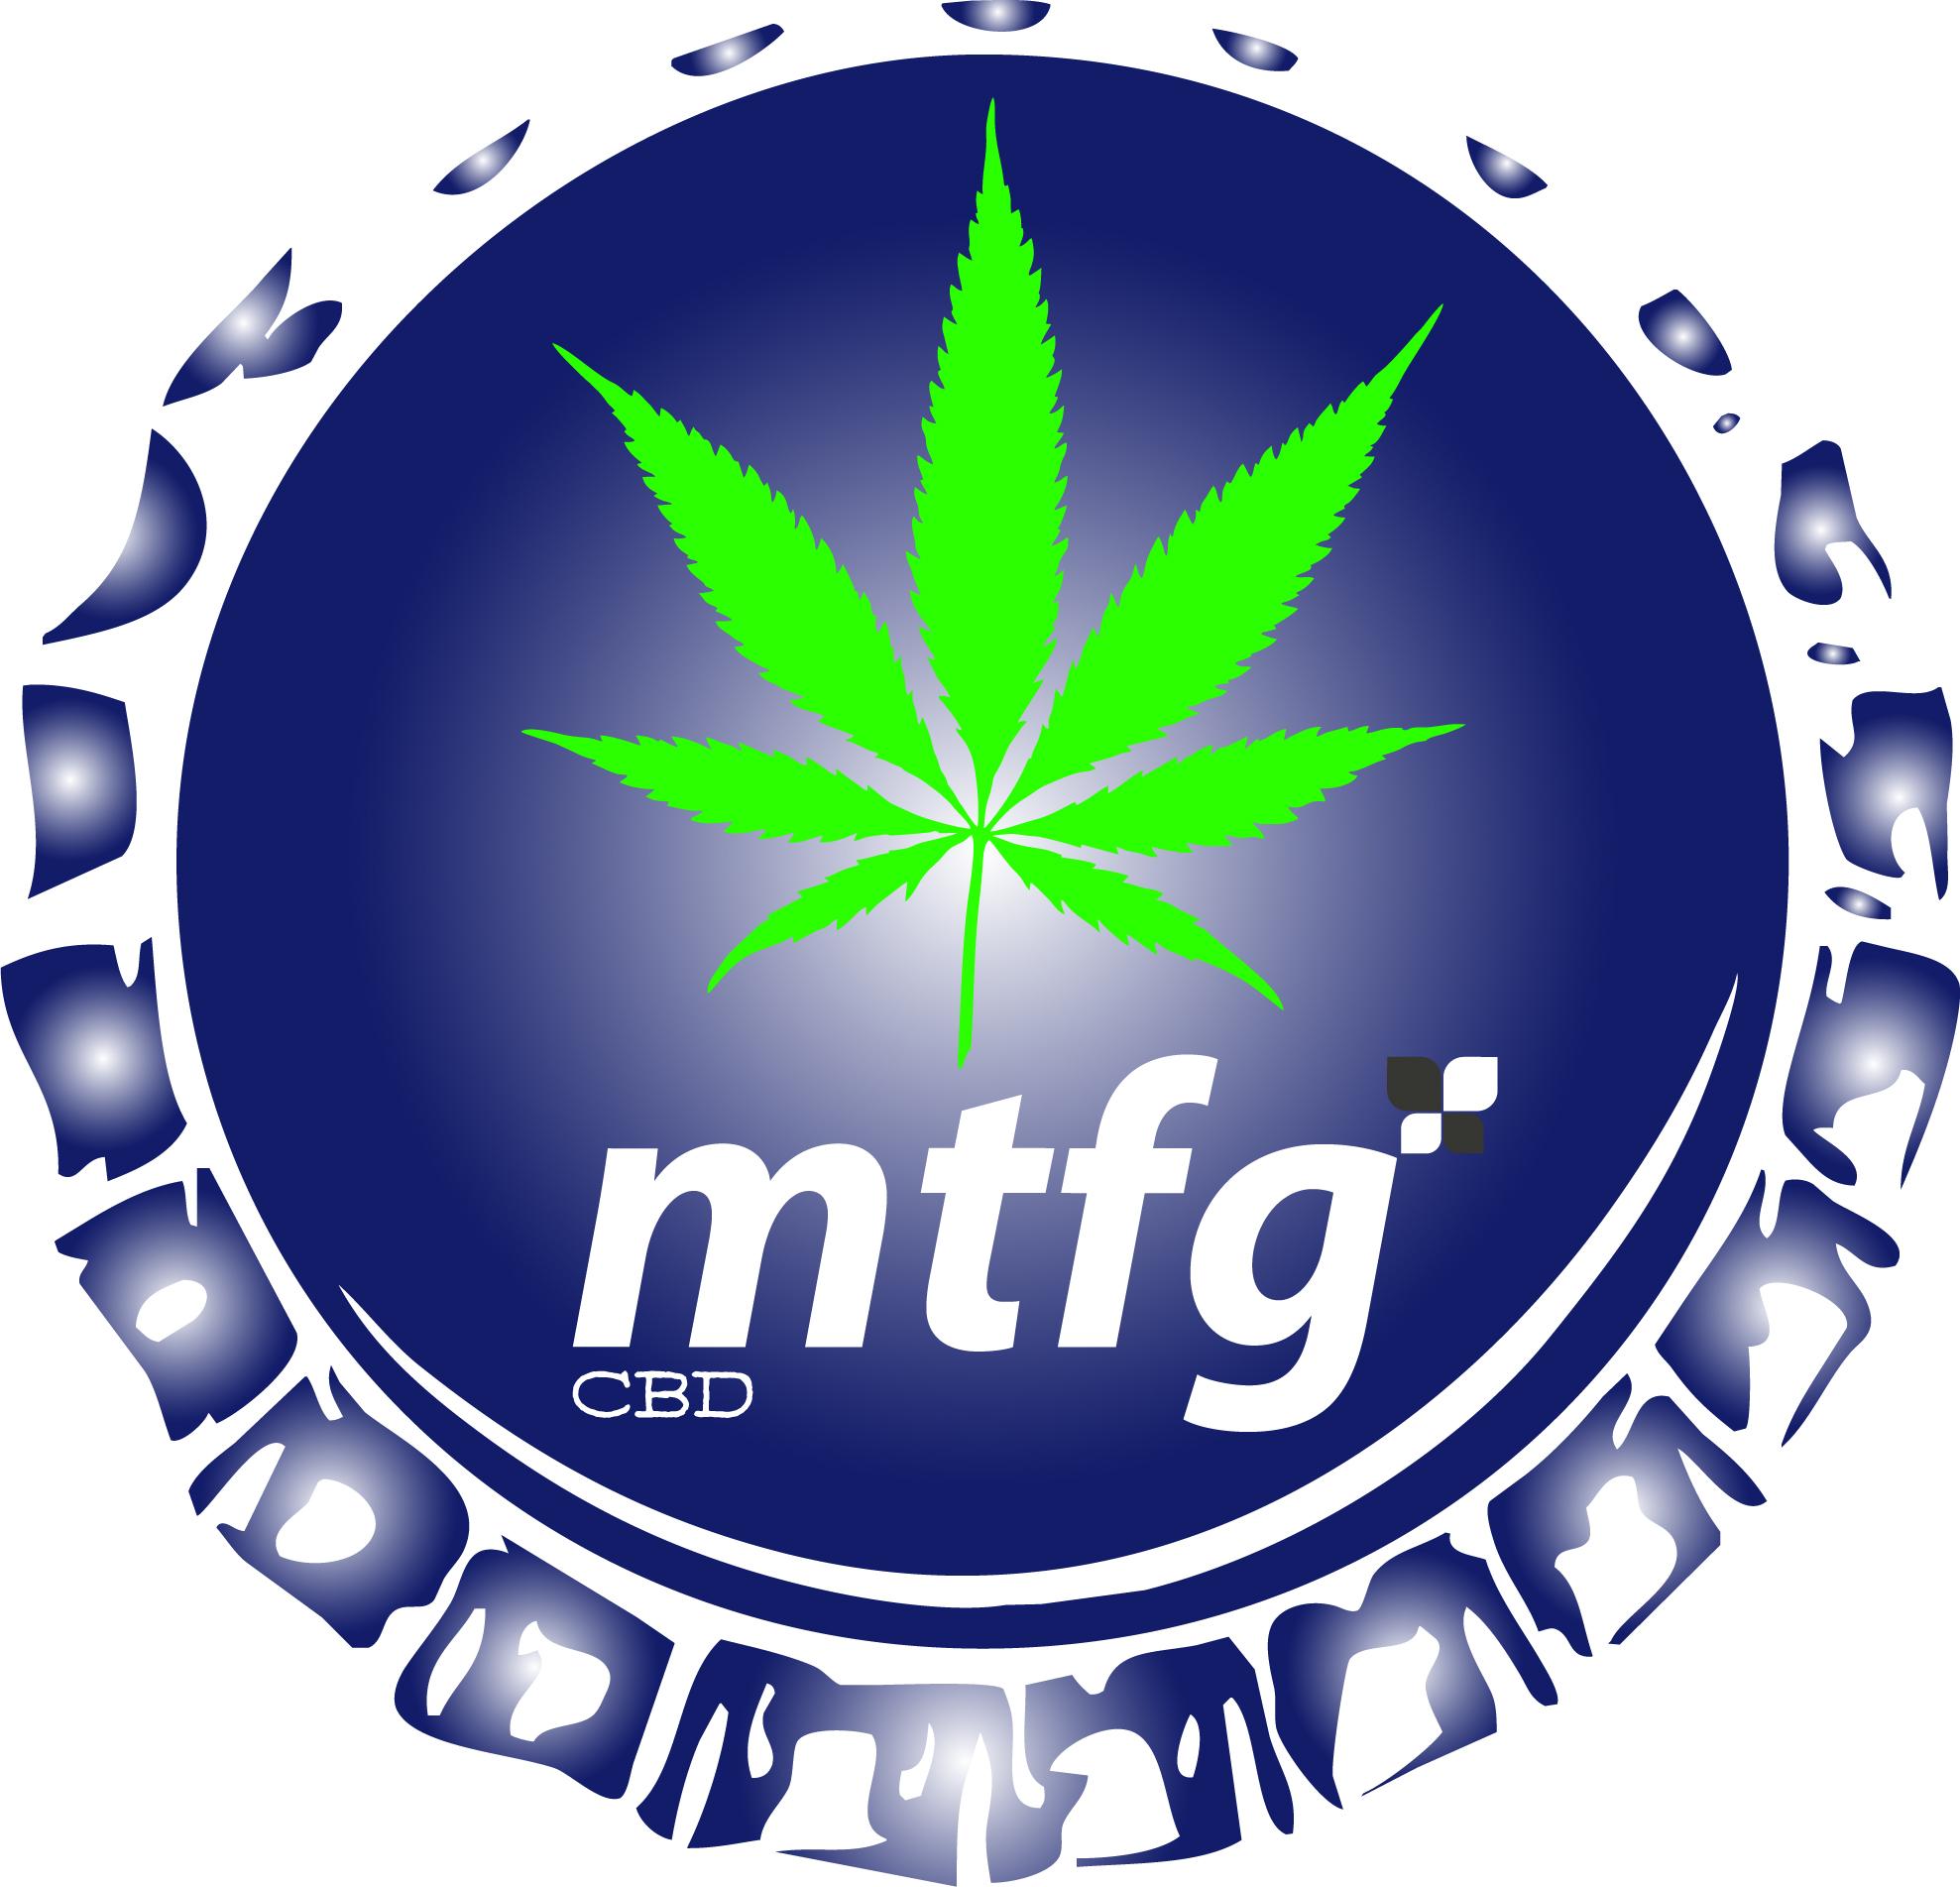 MTFG CBD